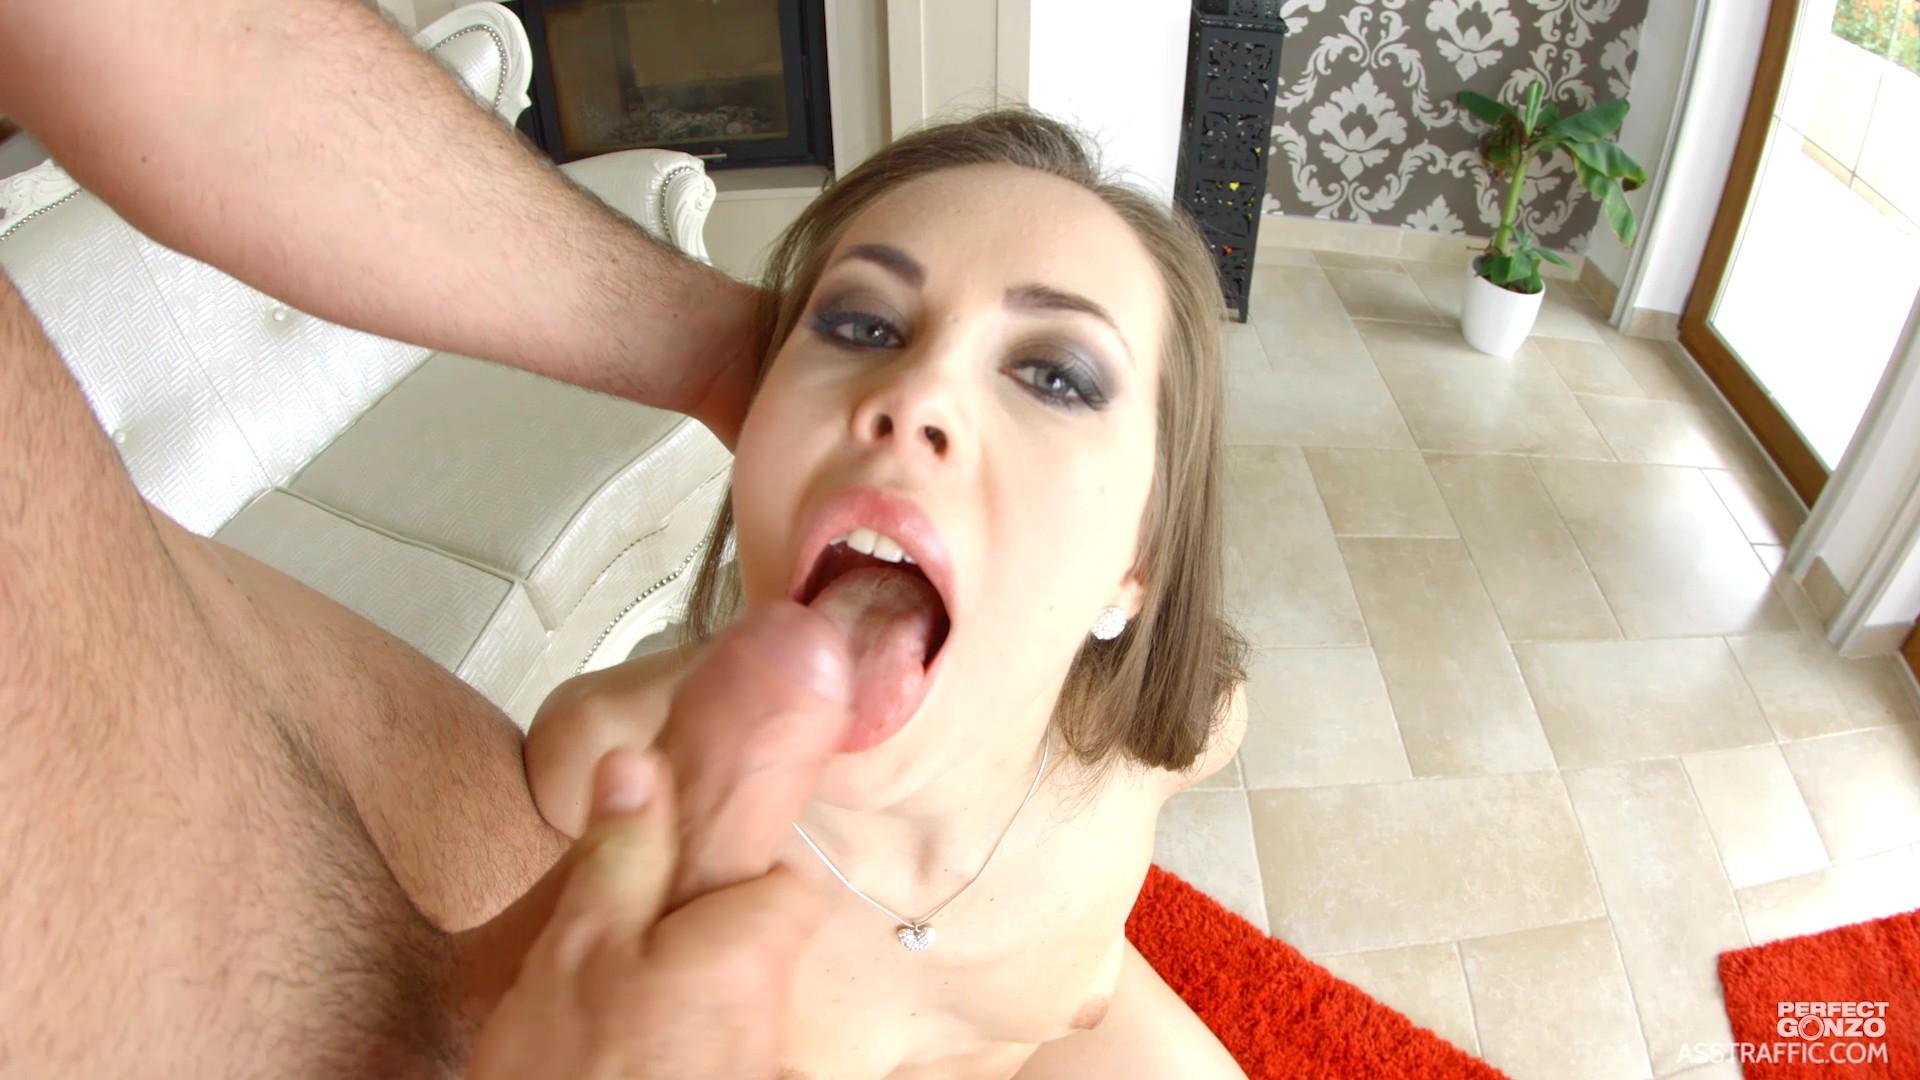 Зрелую симпотичную служанке кончили и на ссали в рот порно